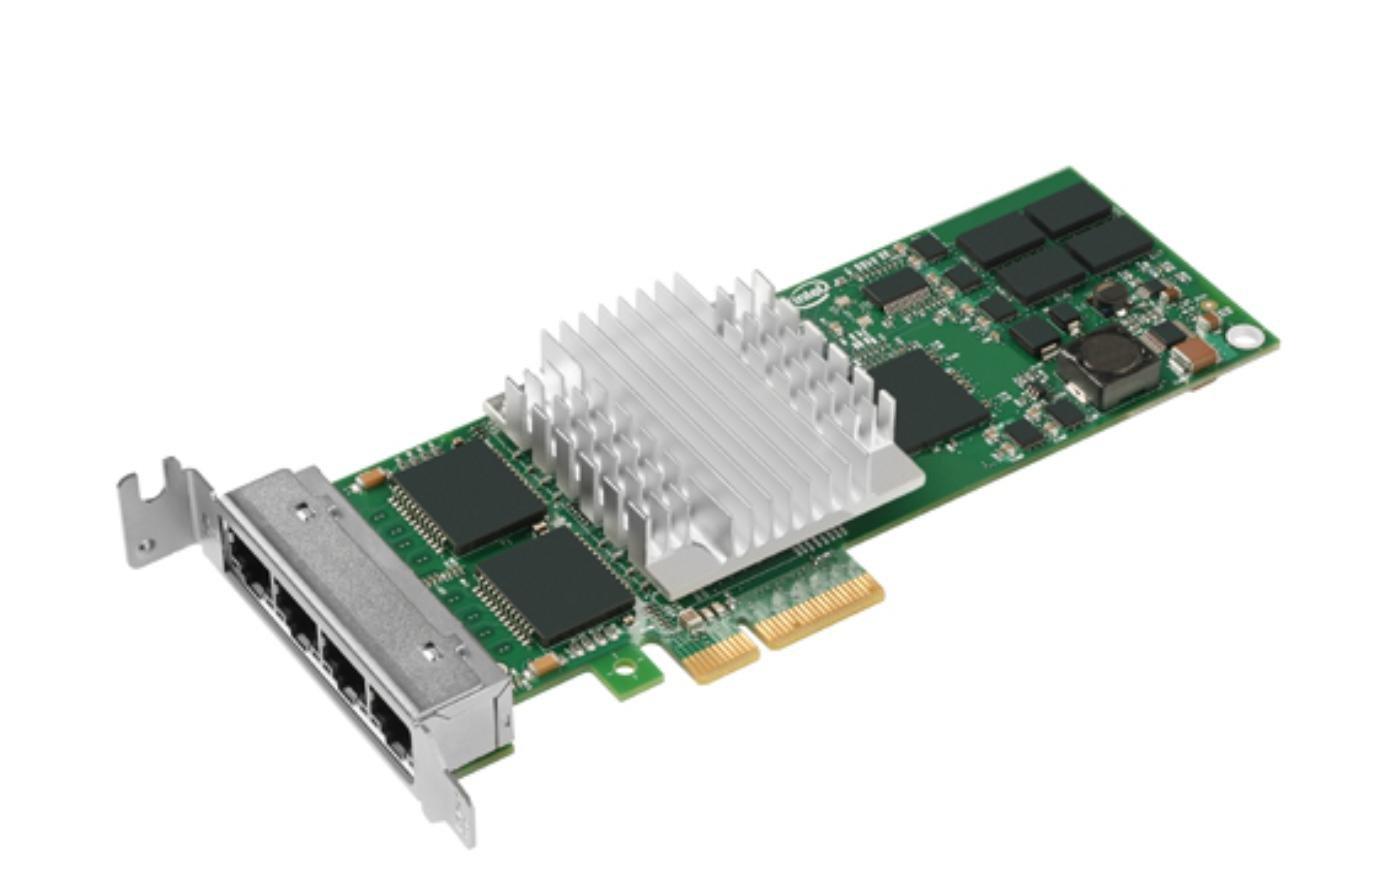 Intel EXPI9404PTL - NIC EXPI9404PTLPAK1 1000BASET PCIE